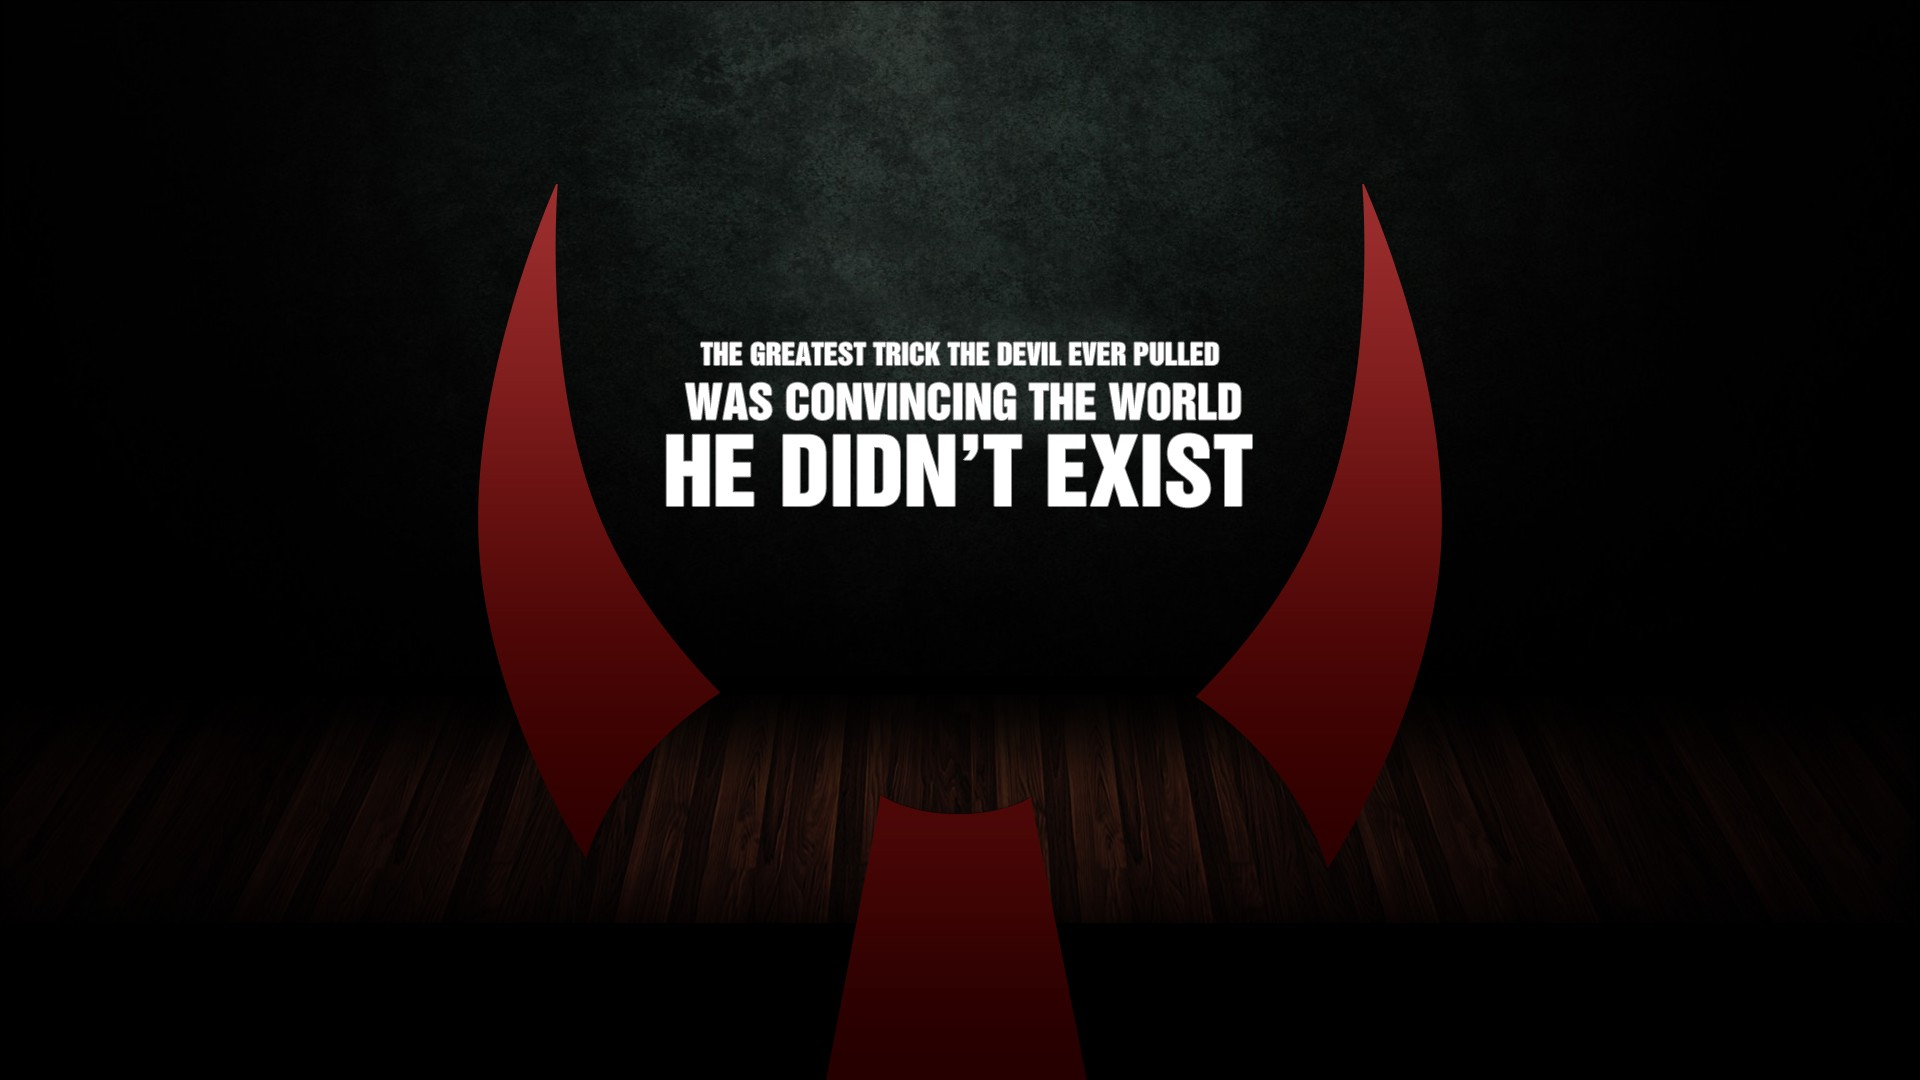 Satan quote #3